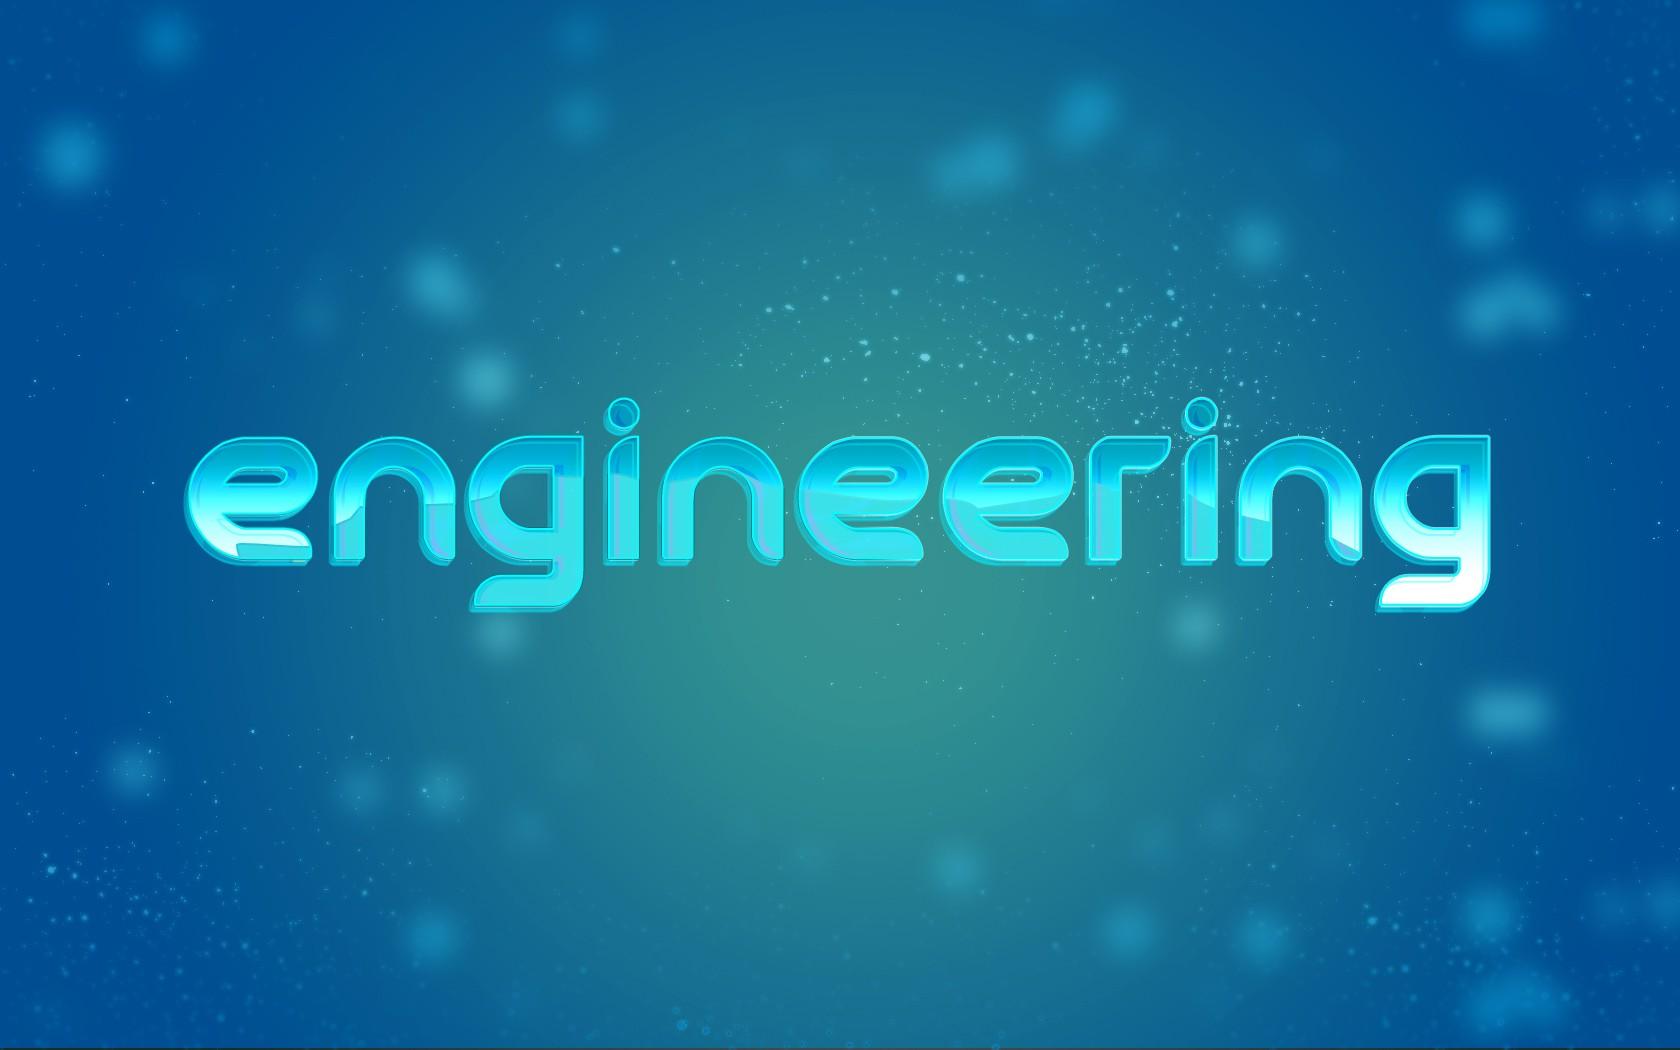 Best 59 Engineers Wallpaper on HipWallpaper Engineers Retarded 1680x1050